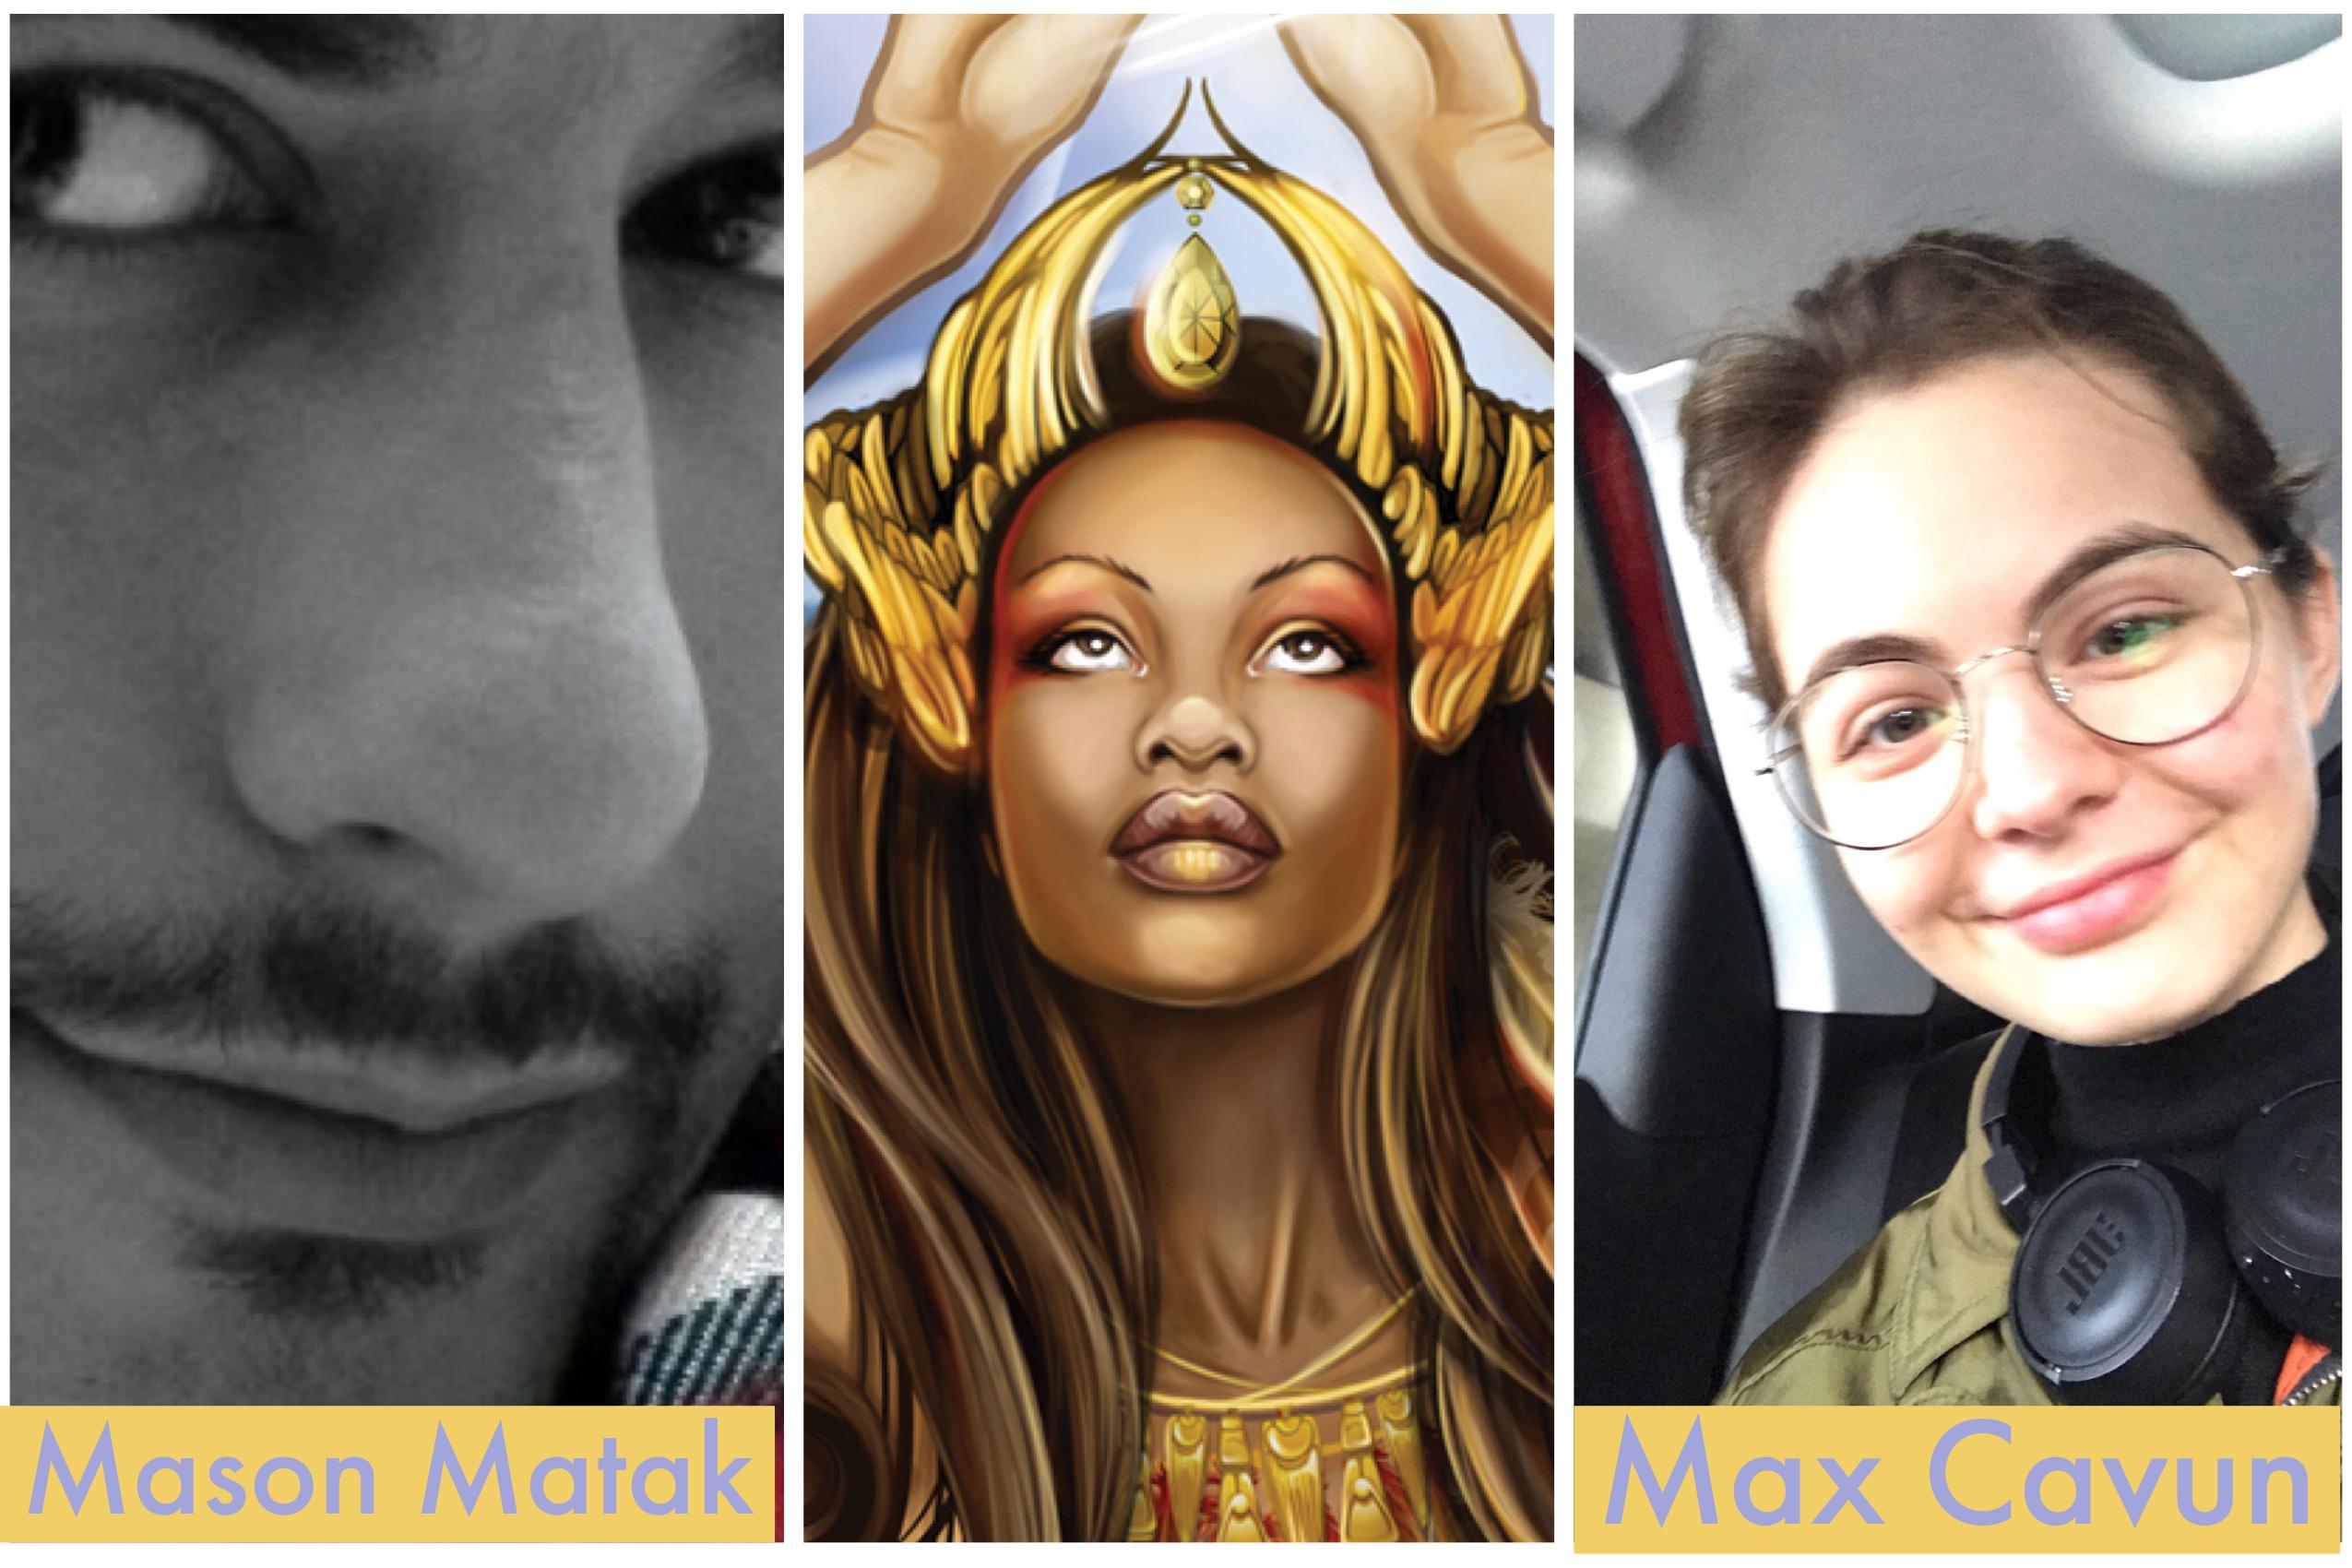 Mason Matak, from Iran, and Max Cavun, from Turkey, are Illustrators of the Future winners